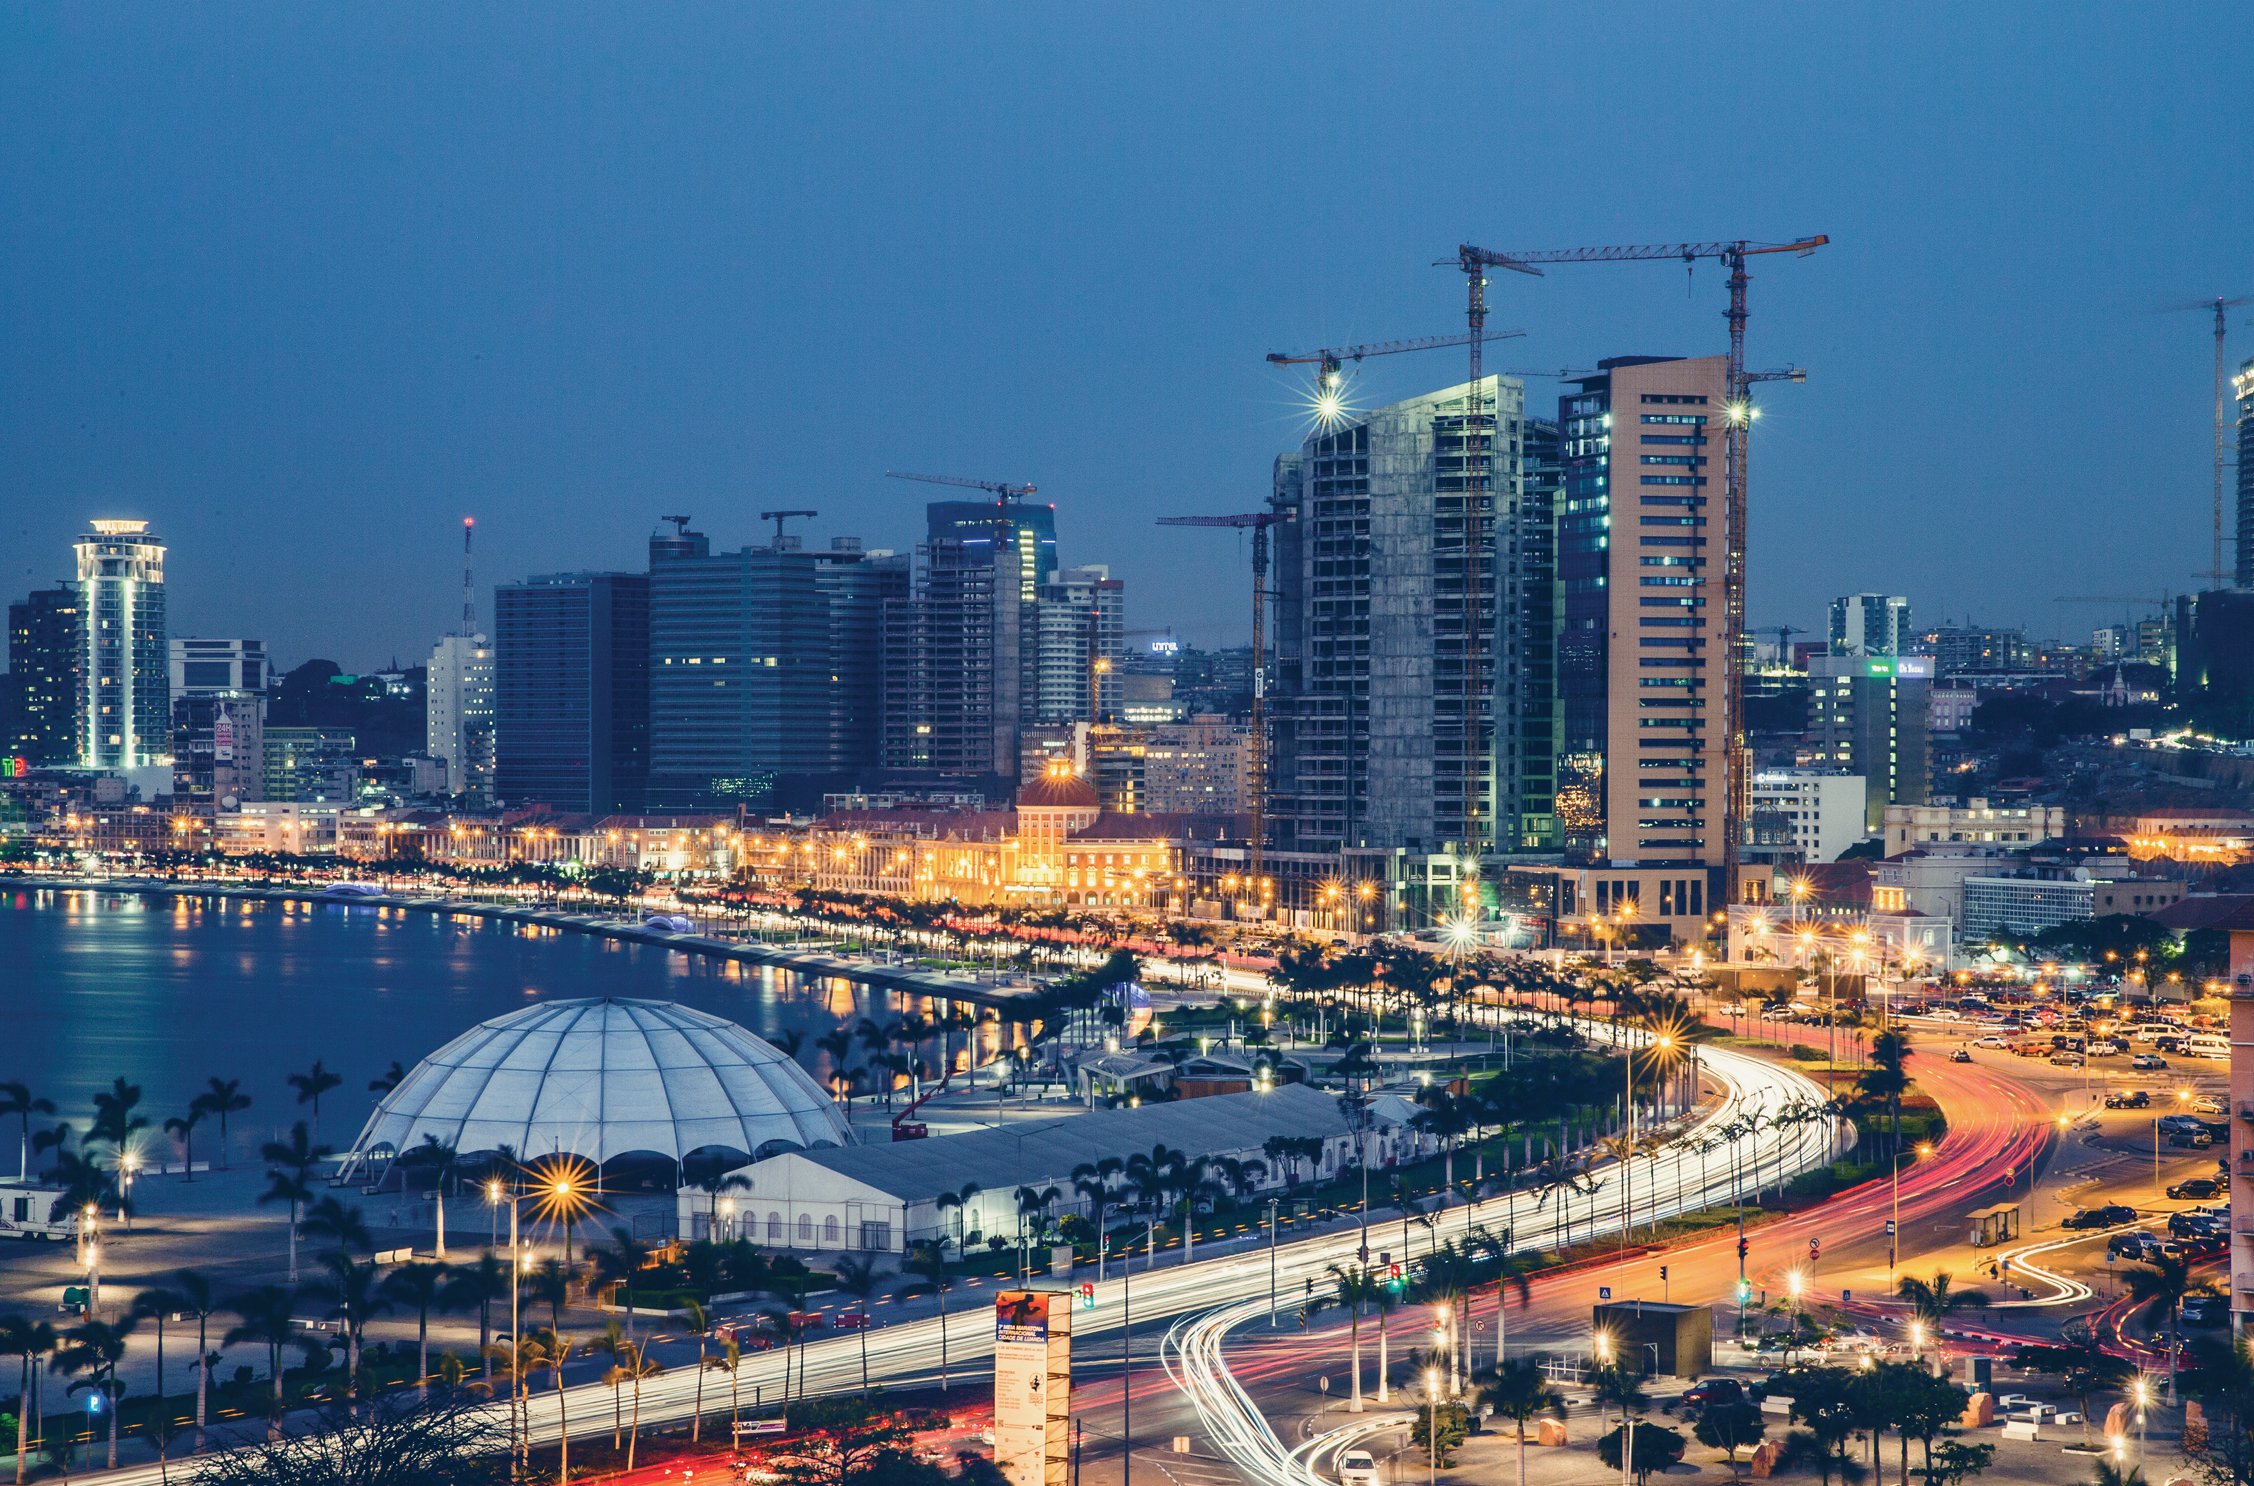 Luanda City